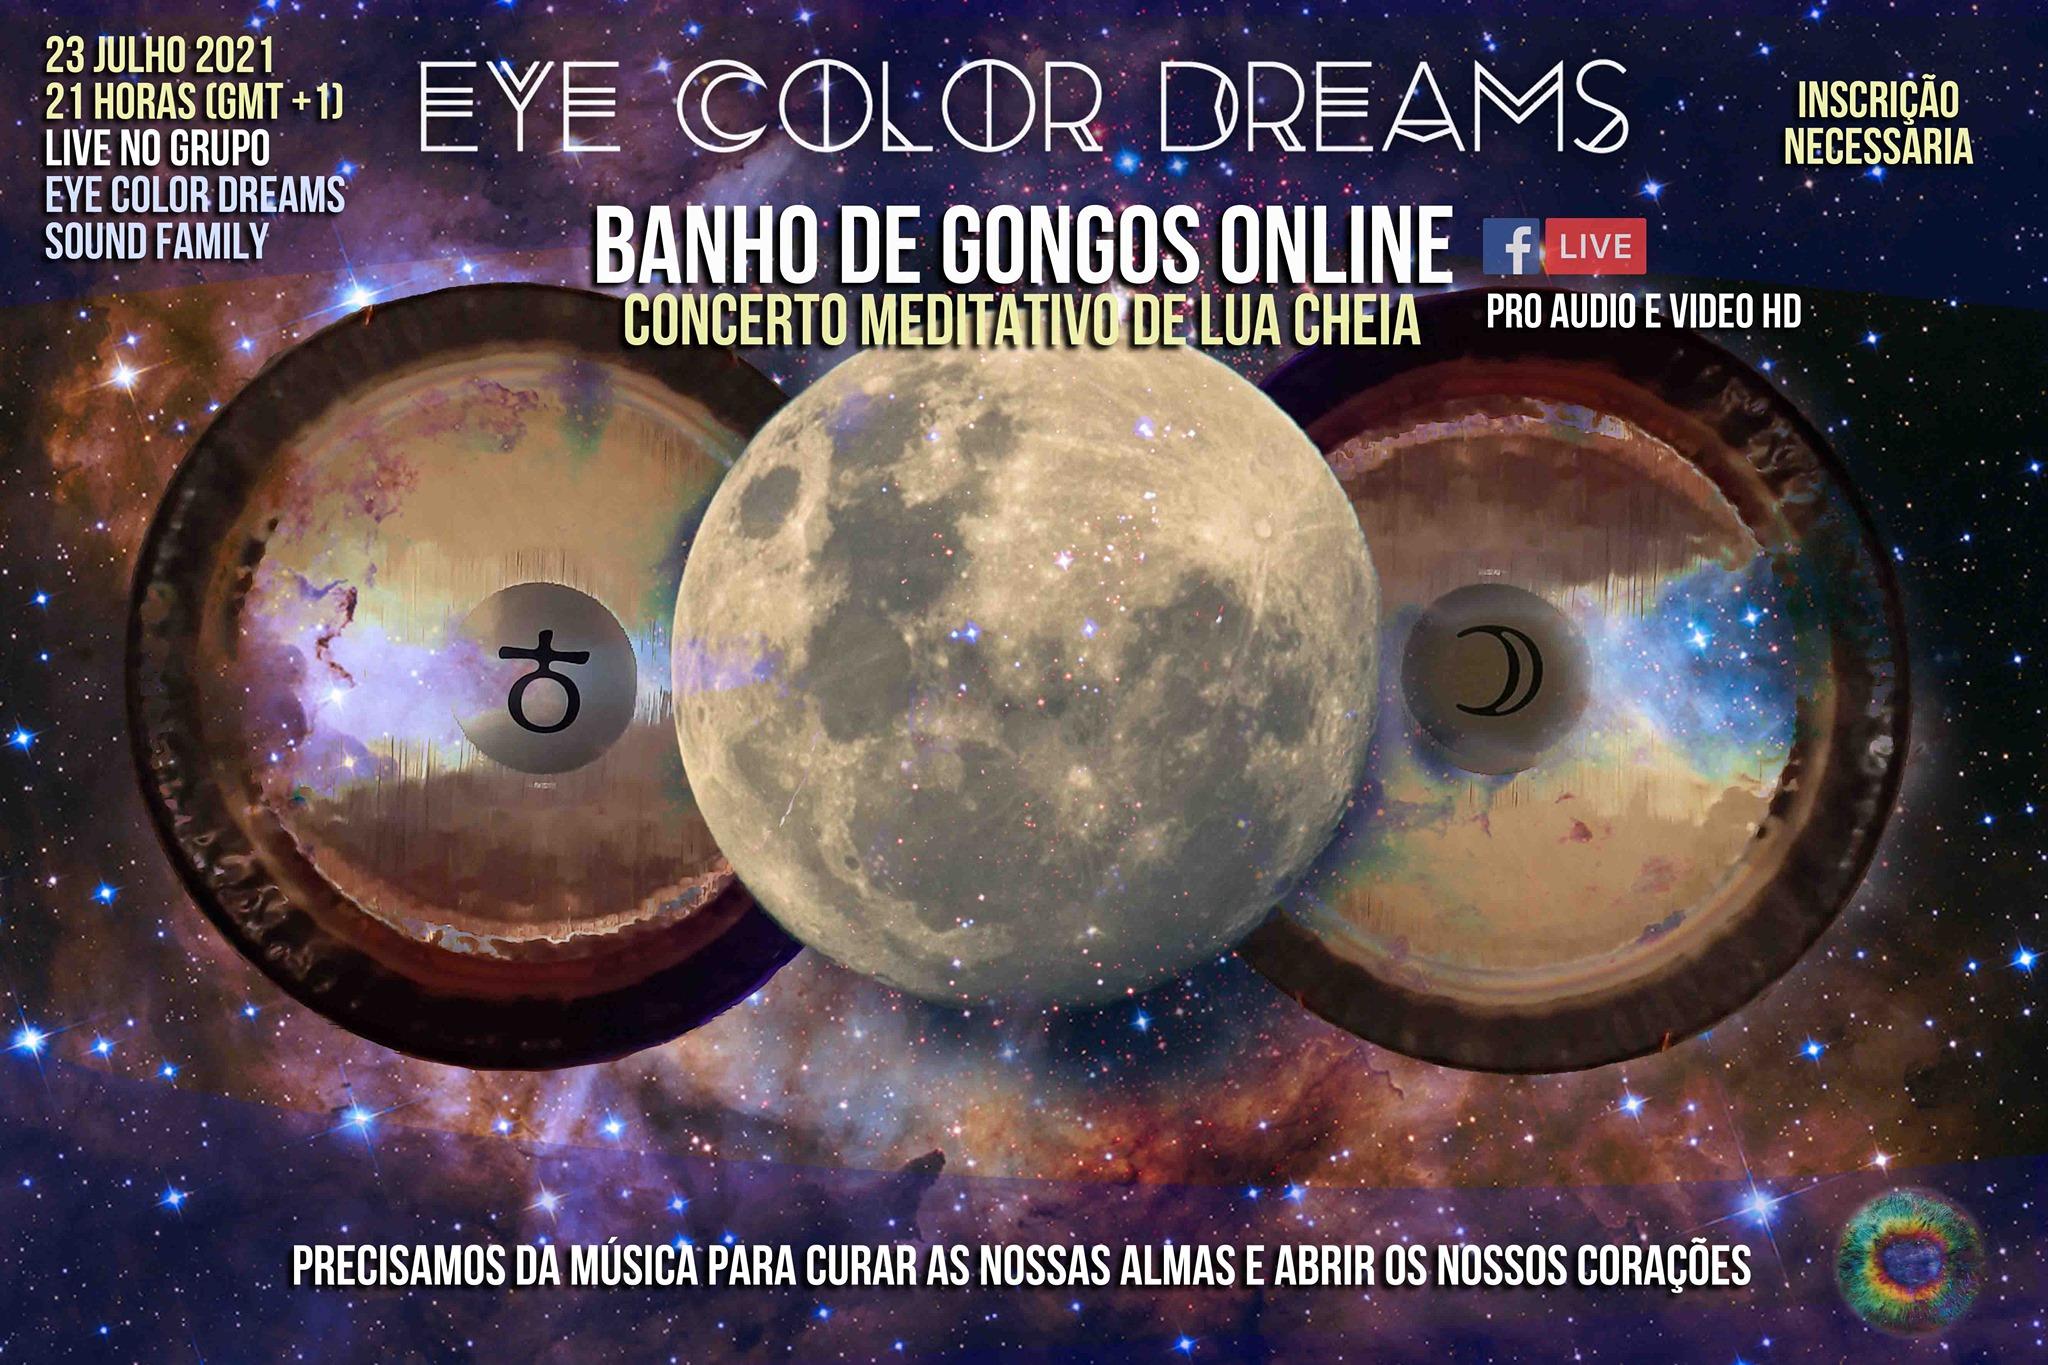 Banho de Gongos Online - Concerto Meditativo de Lua Cheia - Eye Color Dreams